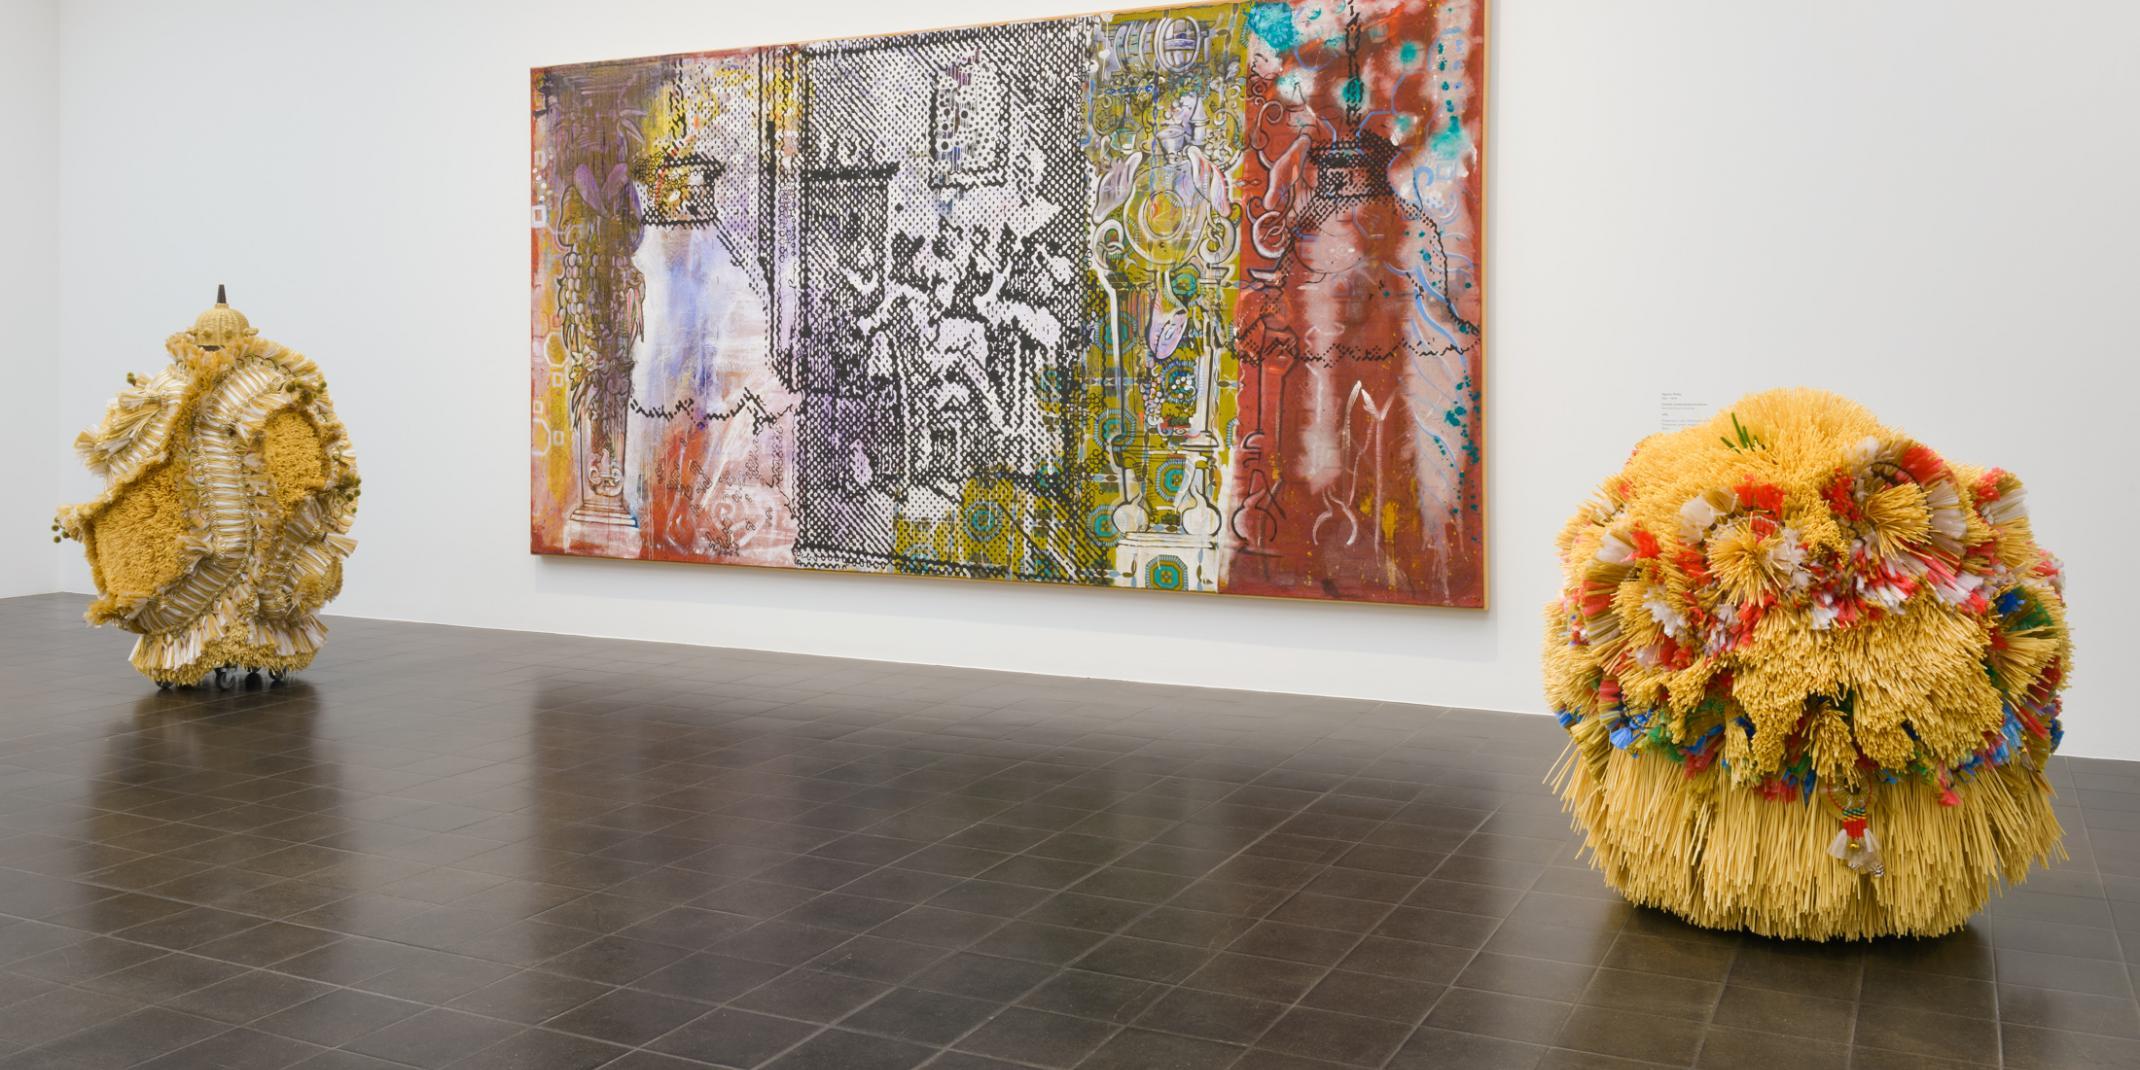 Sigmar Polke (1941-2010)/Hague Yang (*1971) Polke, This is all that remains oft he original Statue, 1974, © Privatsammlung, Foto: Kay Riechers; © VG Bild-Kunst, Bonn / Yang, the Intermediate –Hairy all over, 2016 and The Intermediate-Harvest Spell, 2016 :